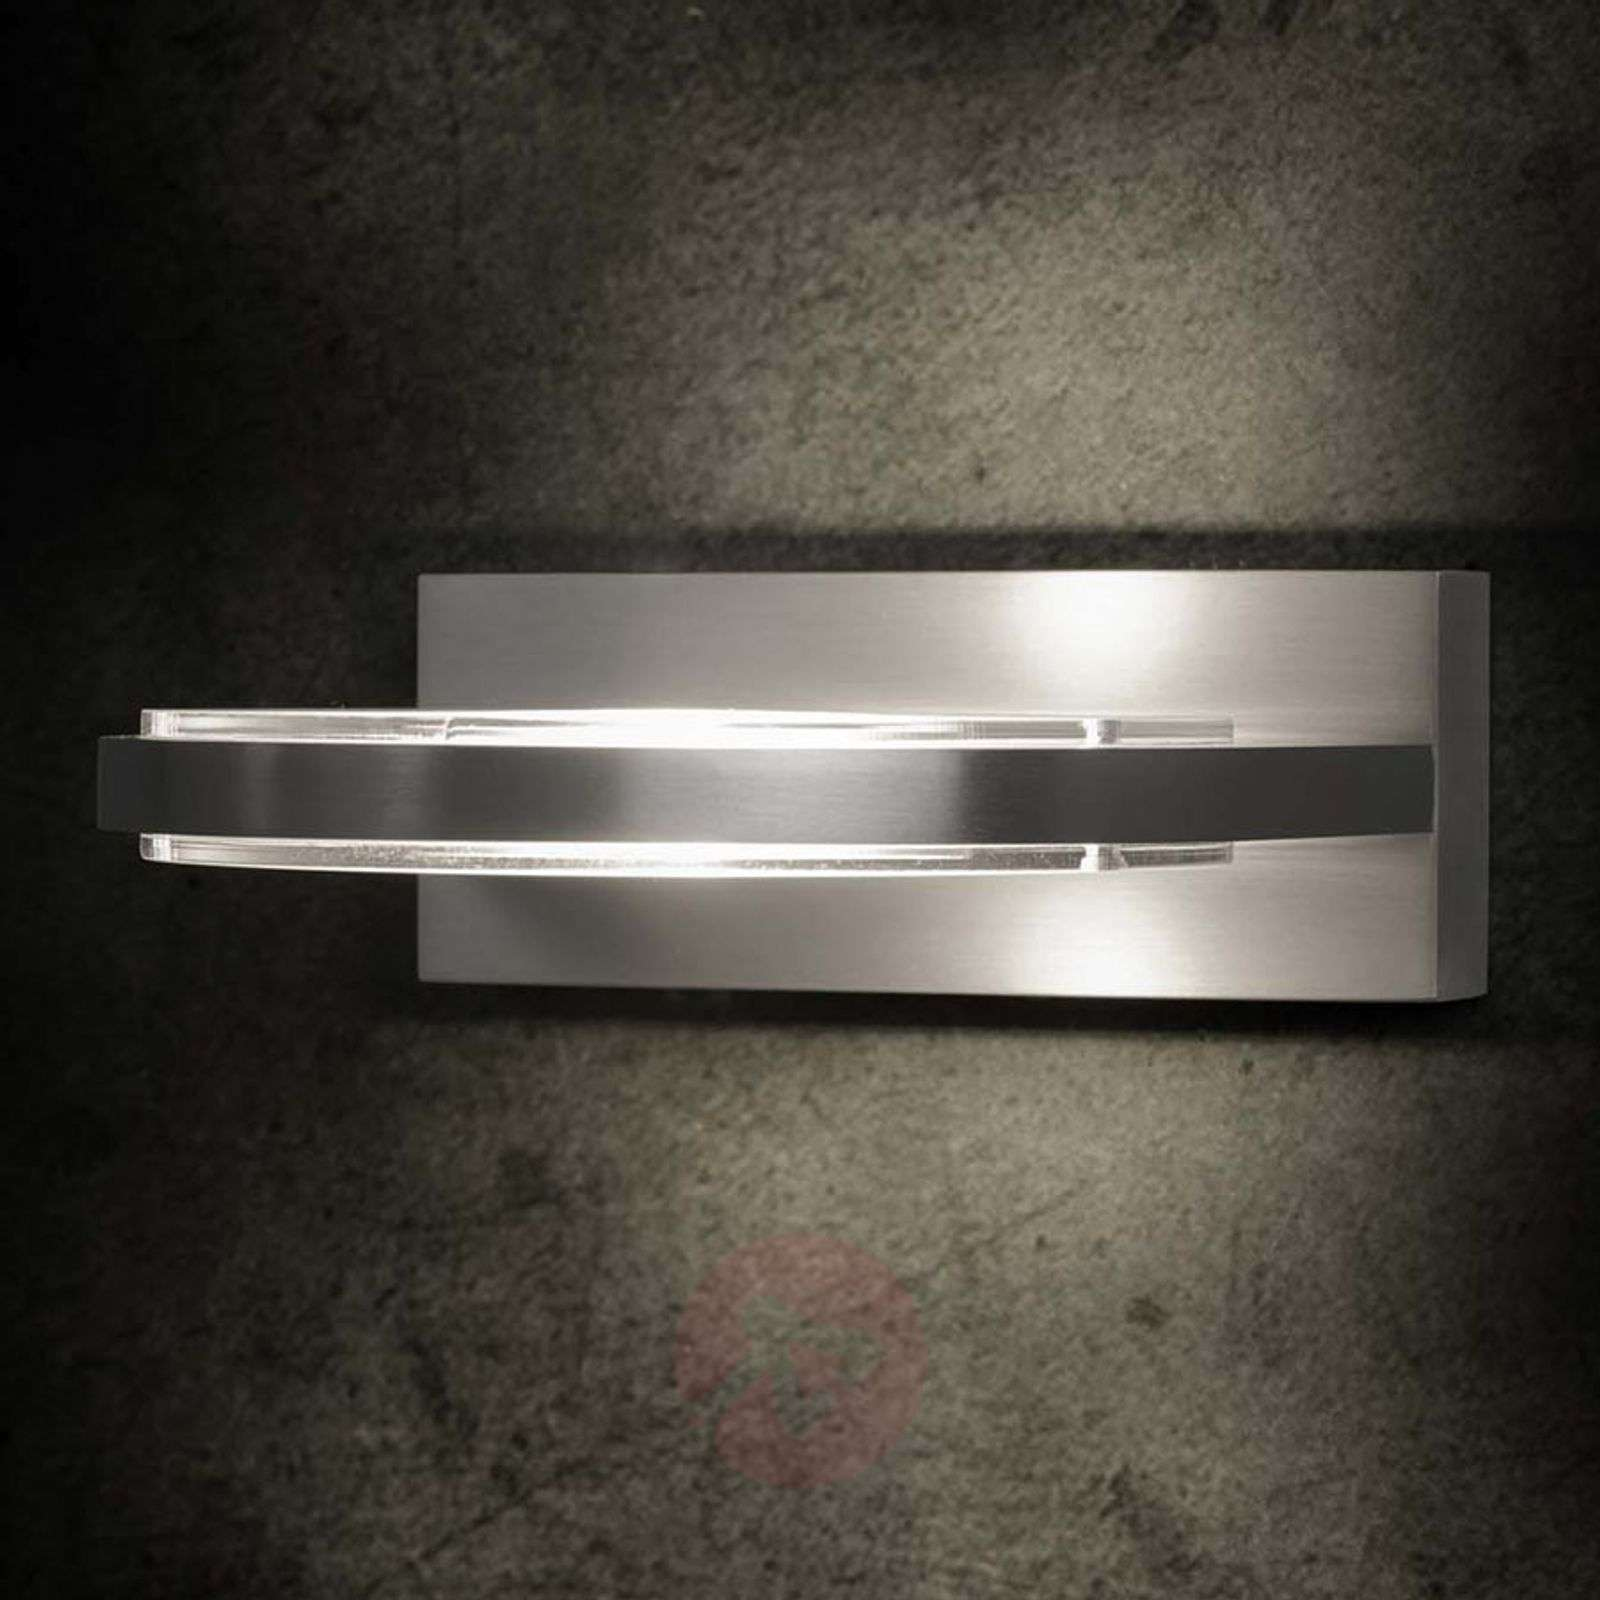 Two-way-shining Wega LED wall light | Lights.ie